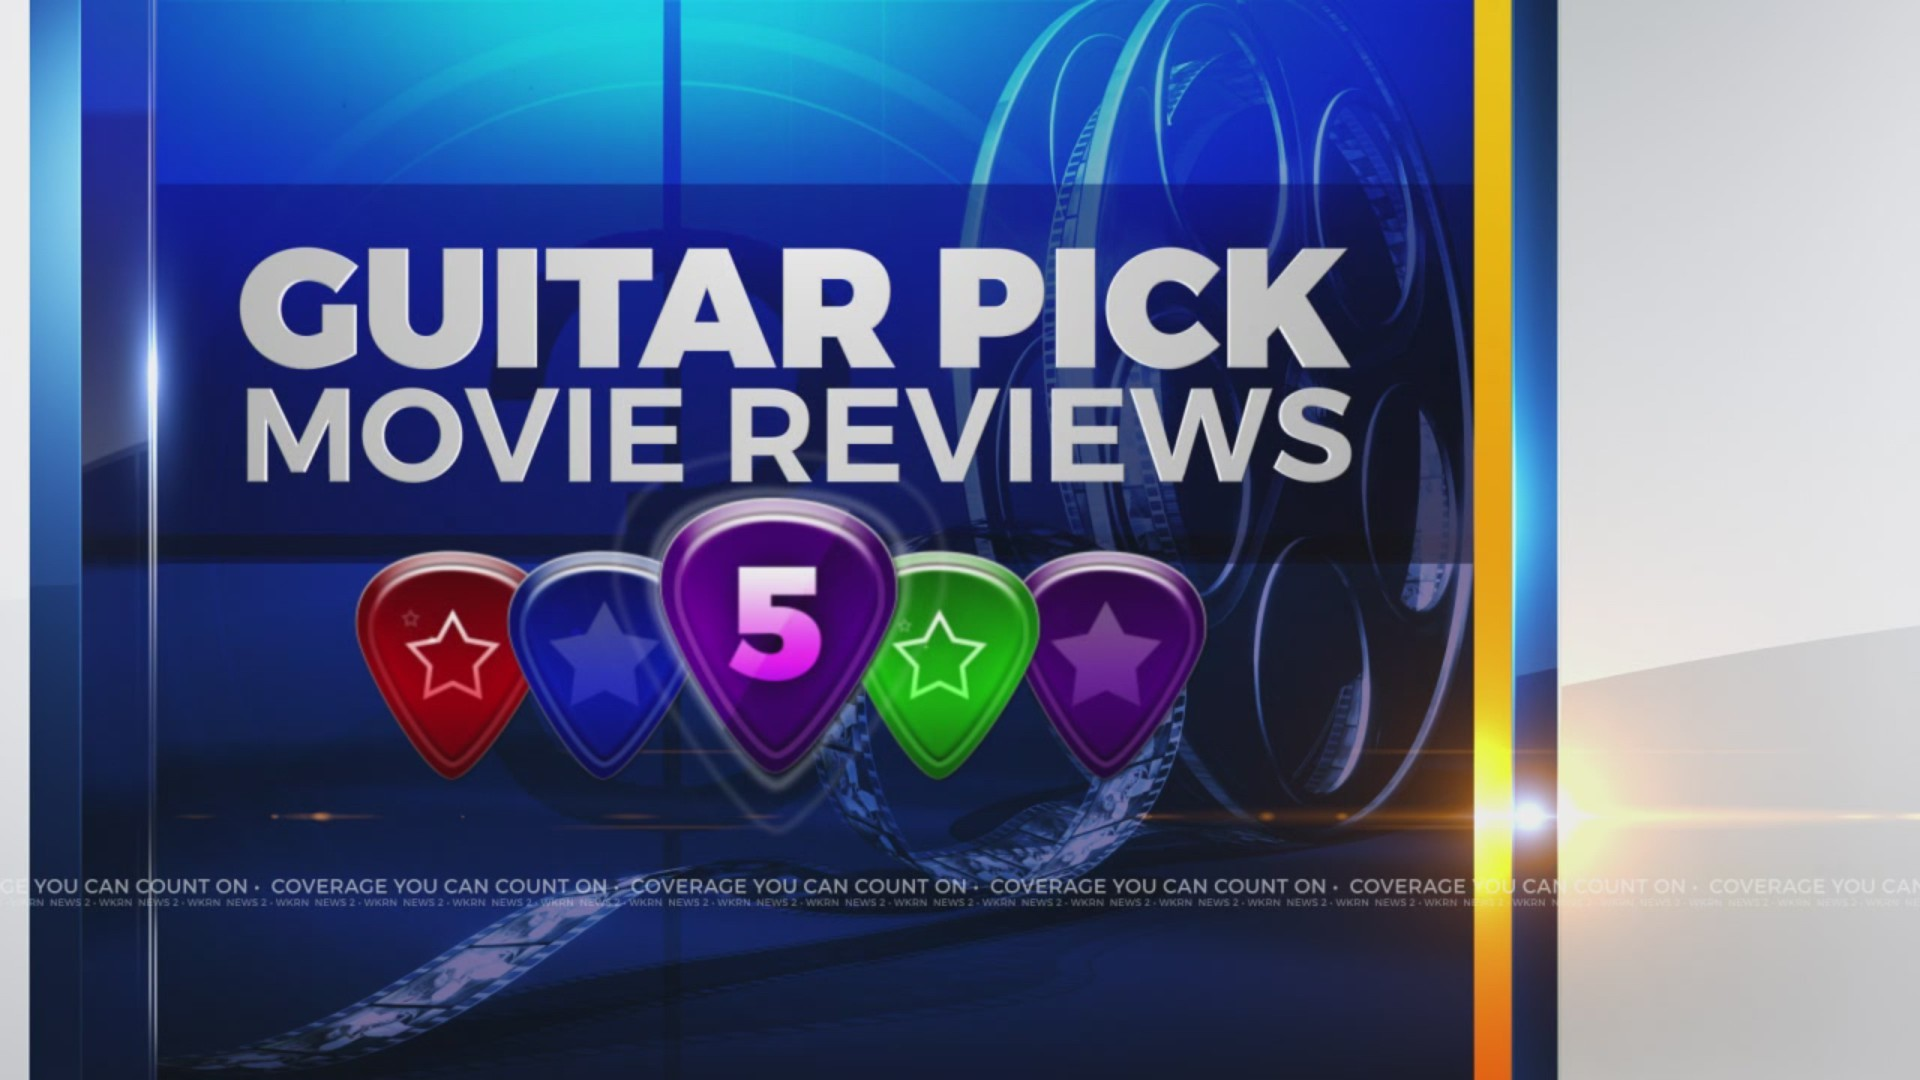 Guitar Pick Movie Reviews